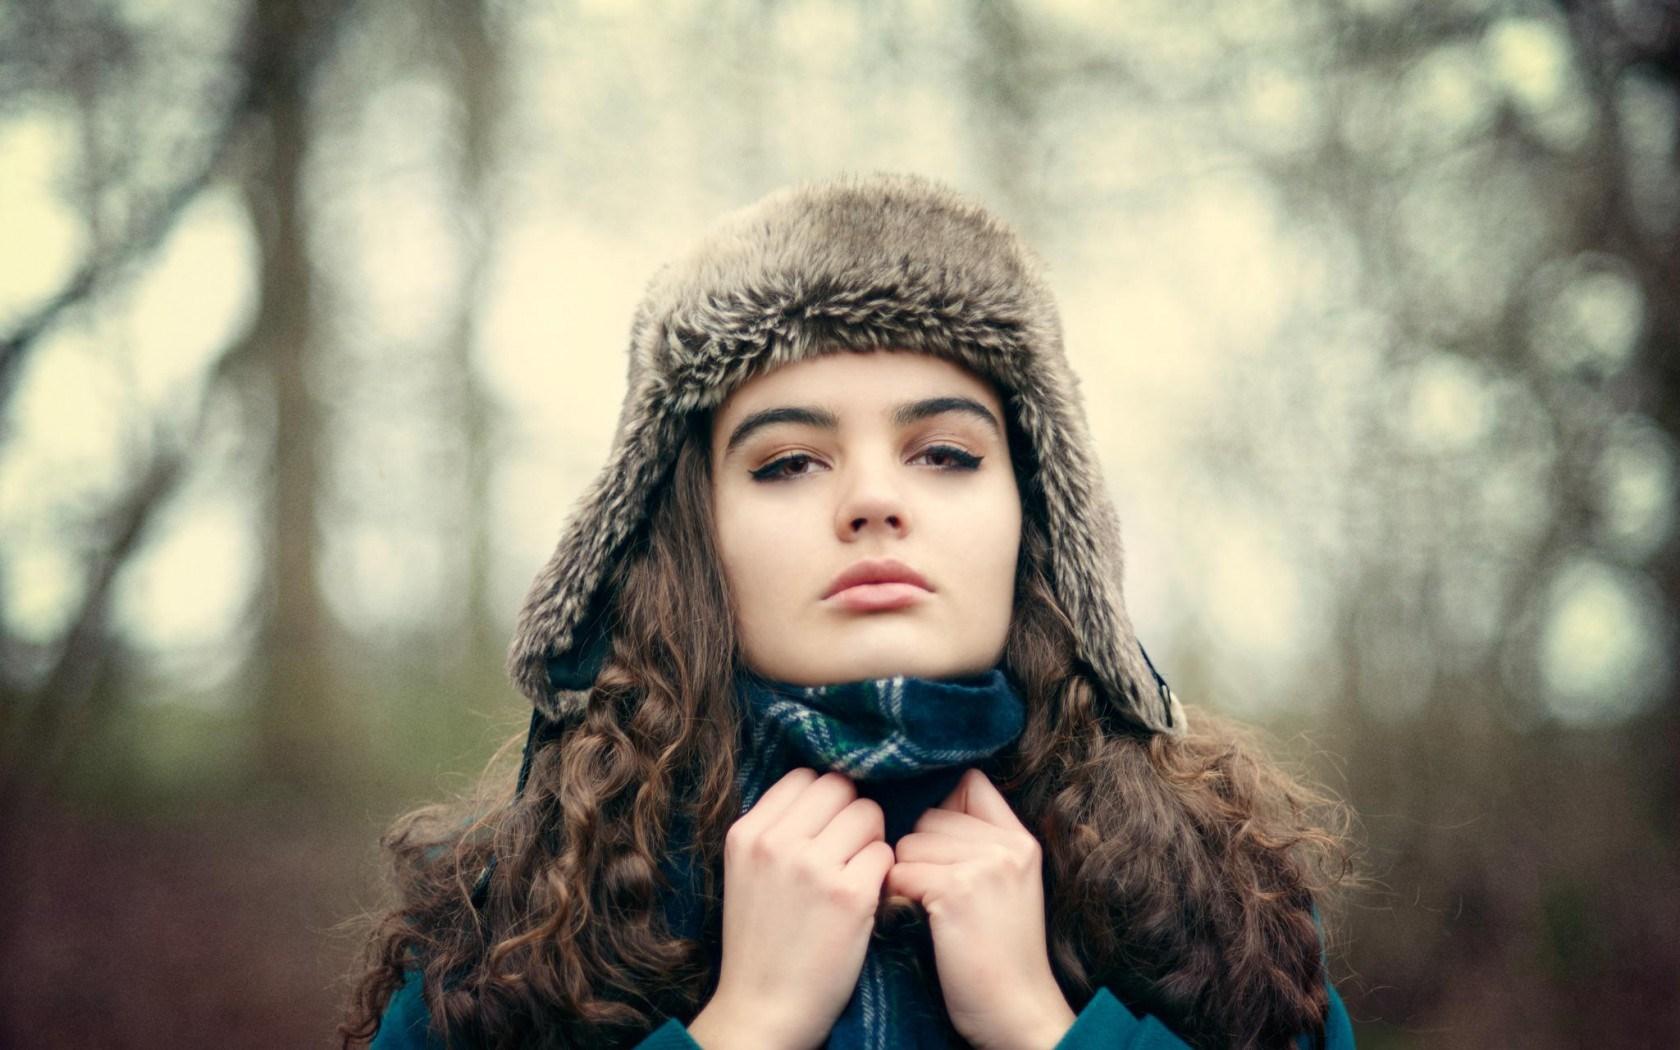 girl hat wallpaper 43334 1680x1050px